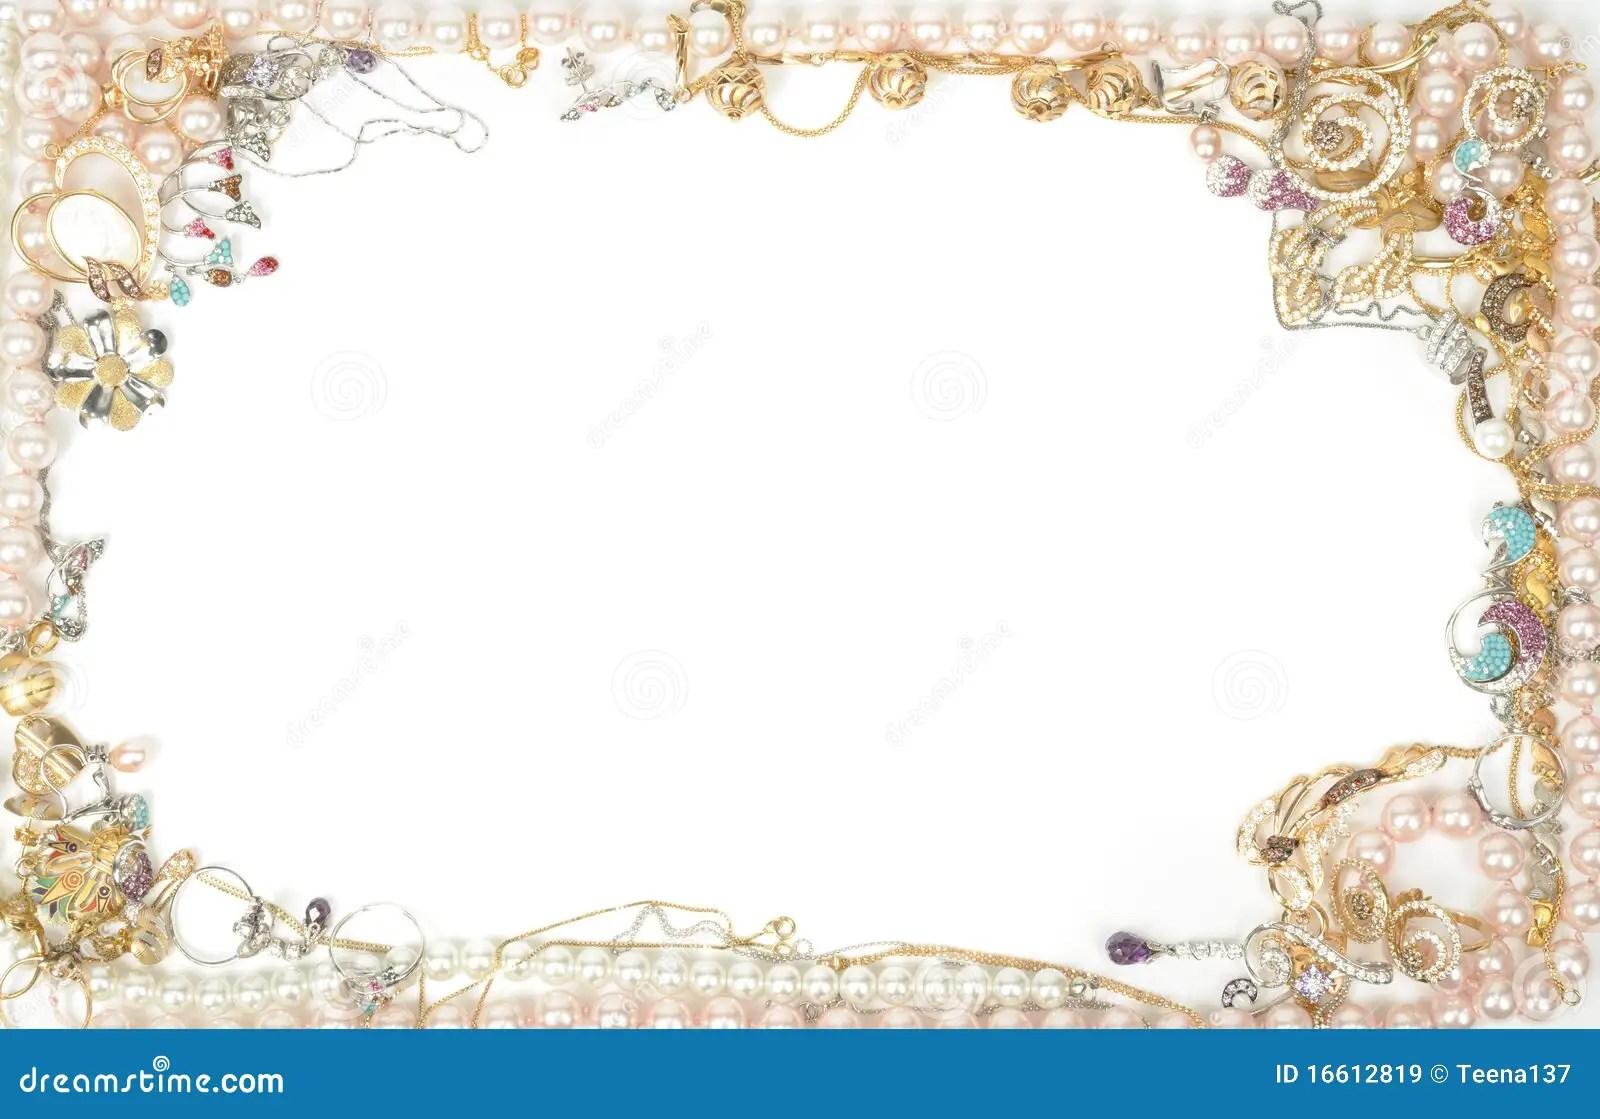 Jewelry Border Stock Image Image Of Shape Jewel Ritch